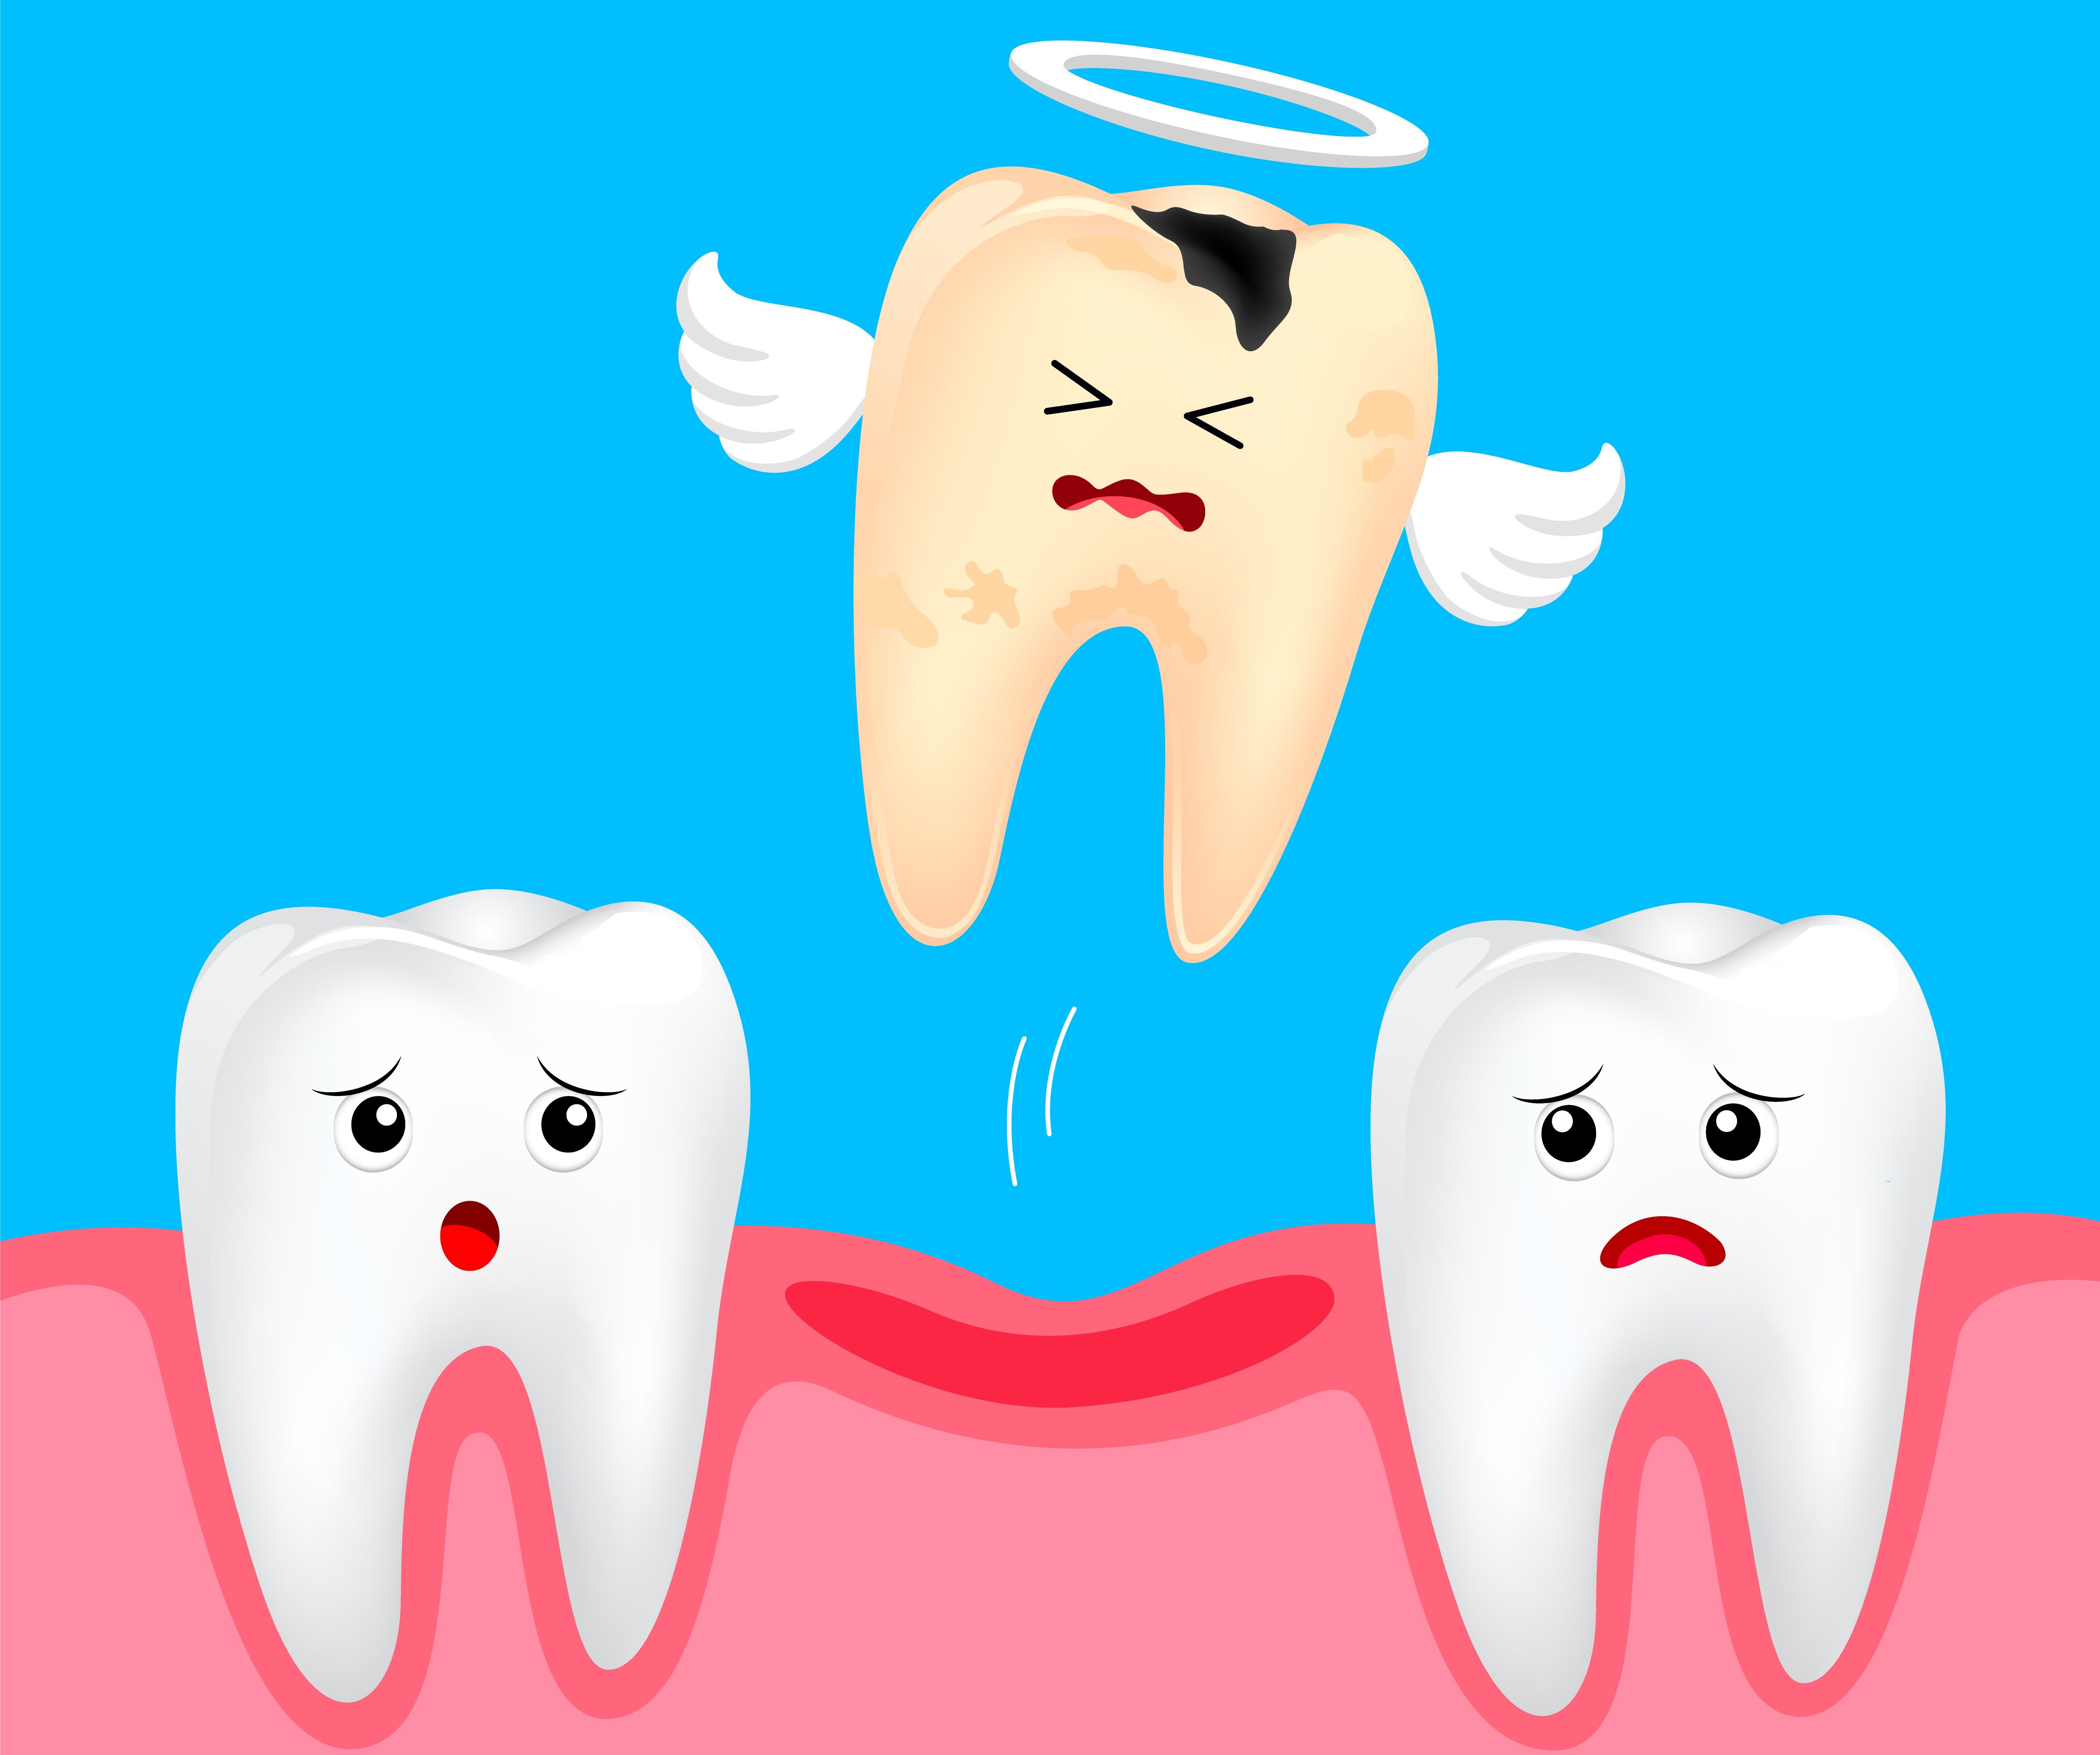 Открытка зубик не боли, днем